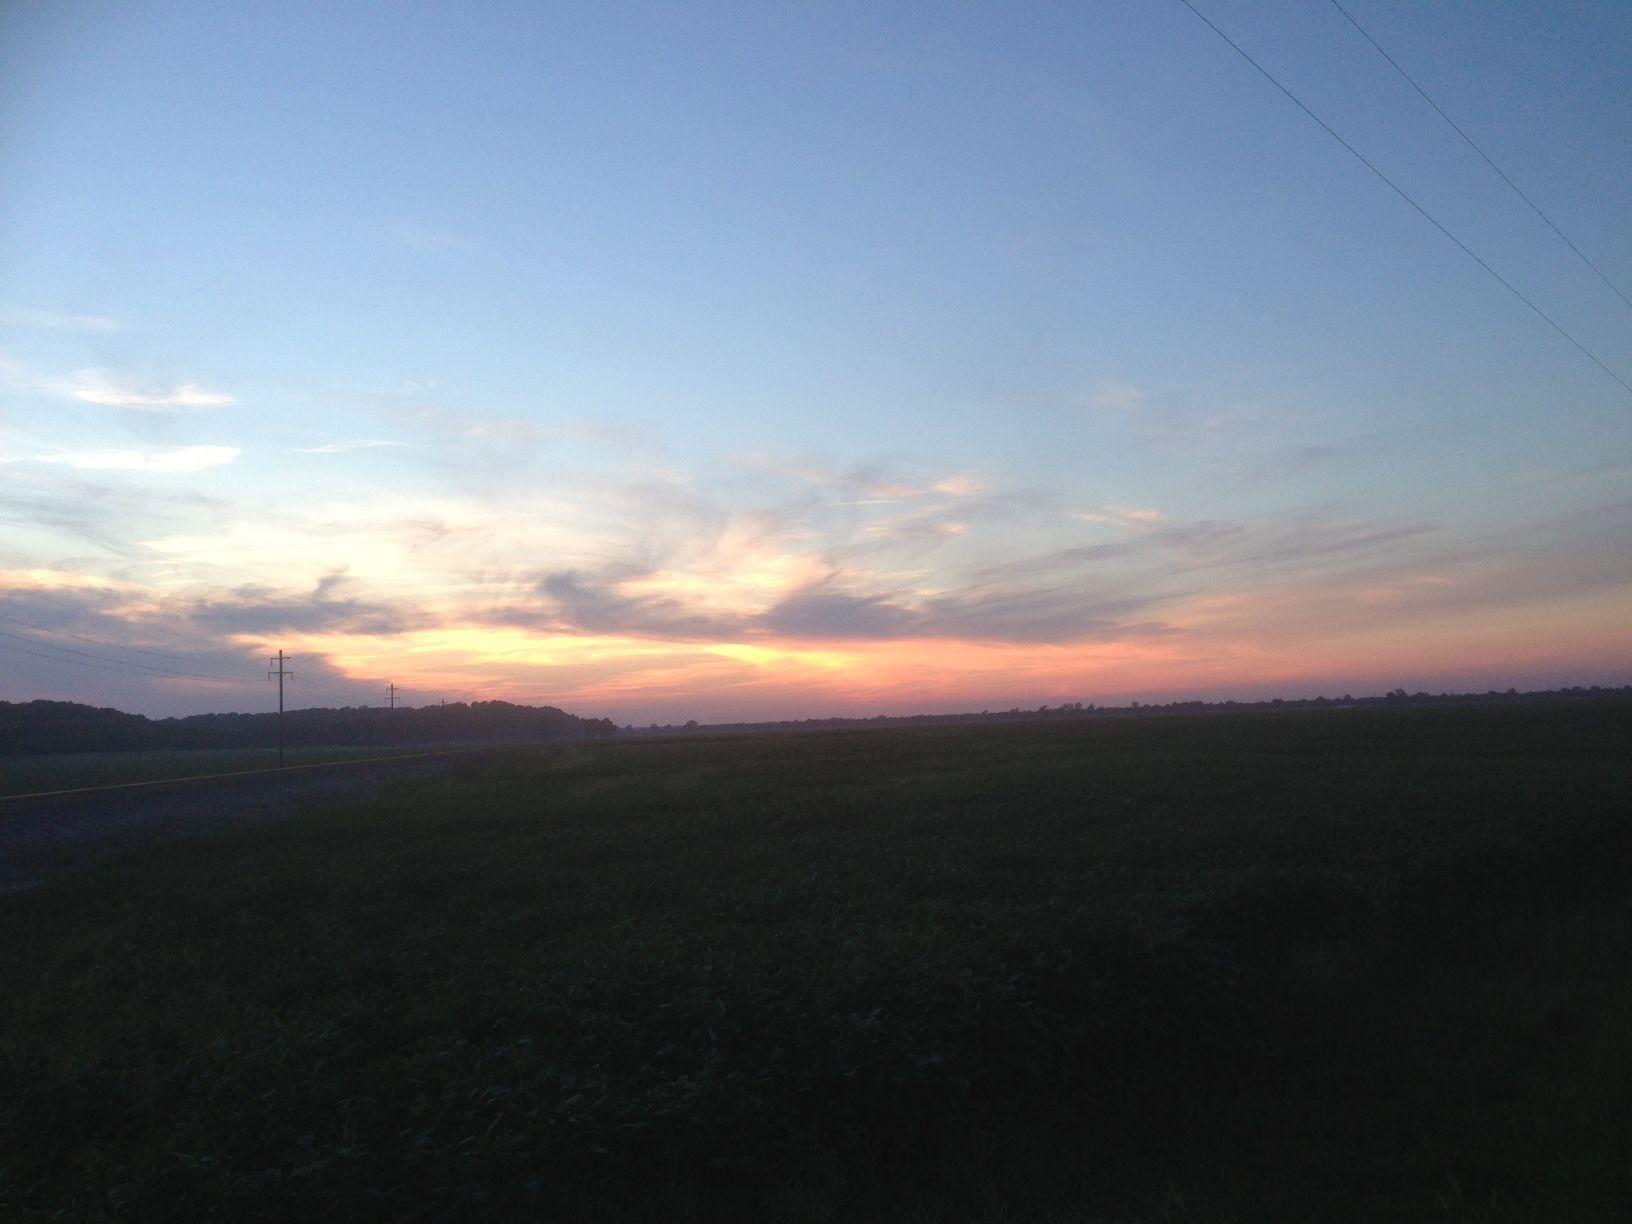 Illinois randolph county baldwin - Late Summer Sunset In Randolph County Il Photo Courtesy Of Christopher Martin Randolph